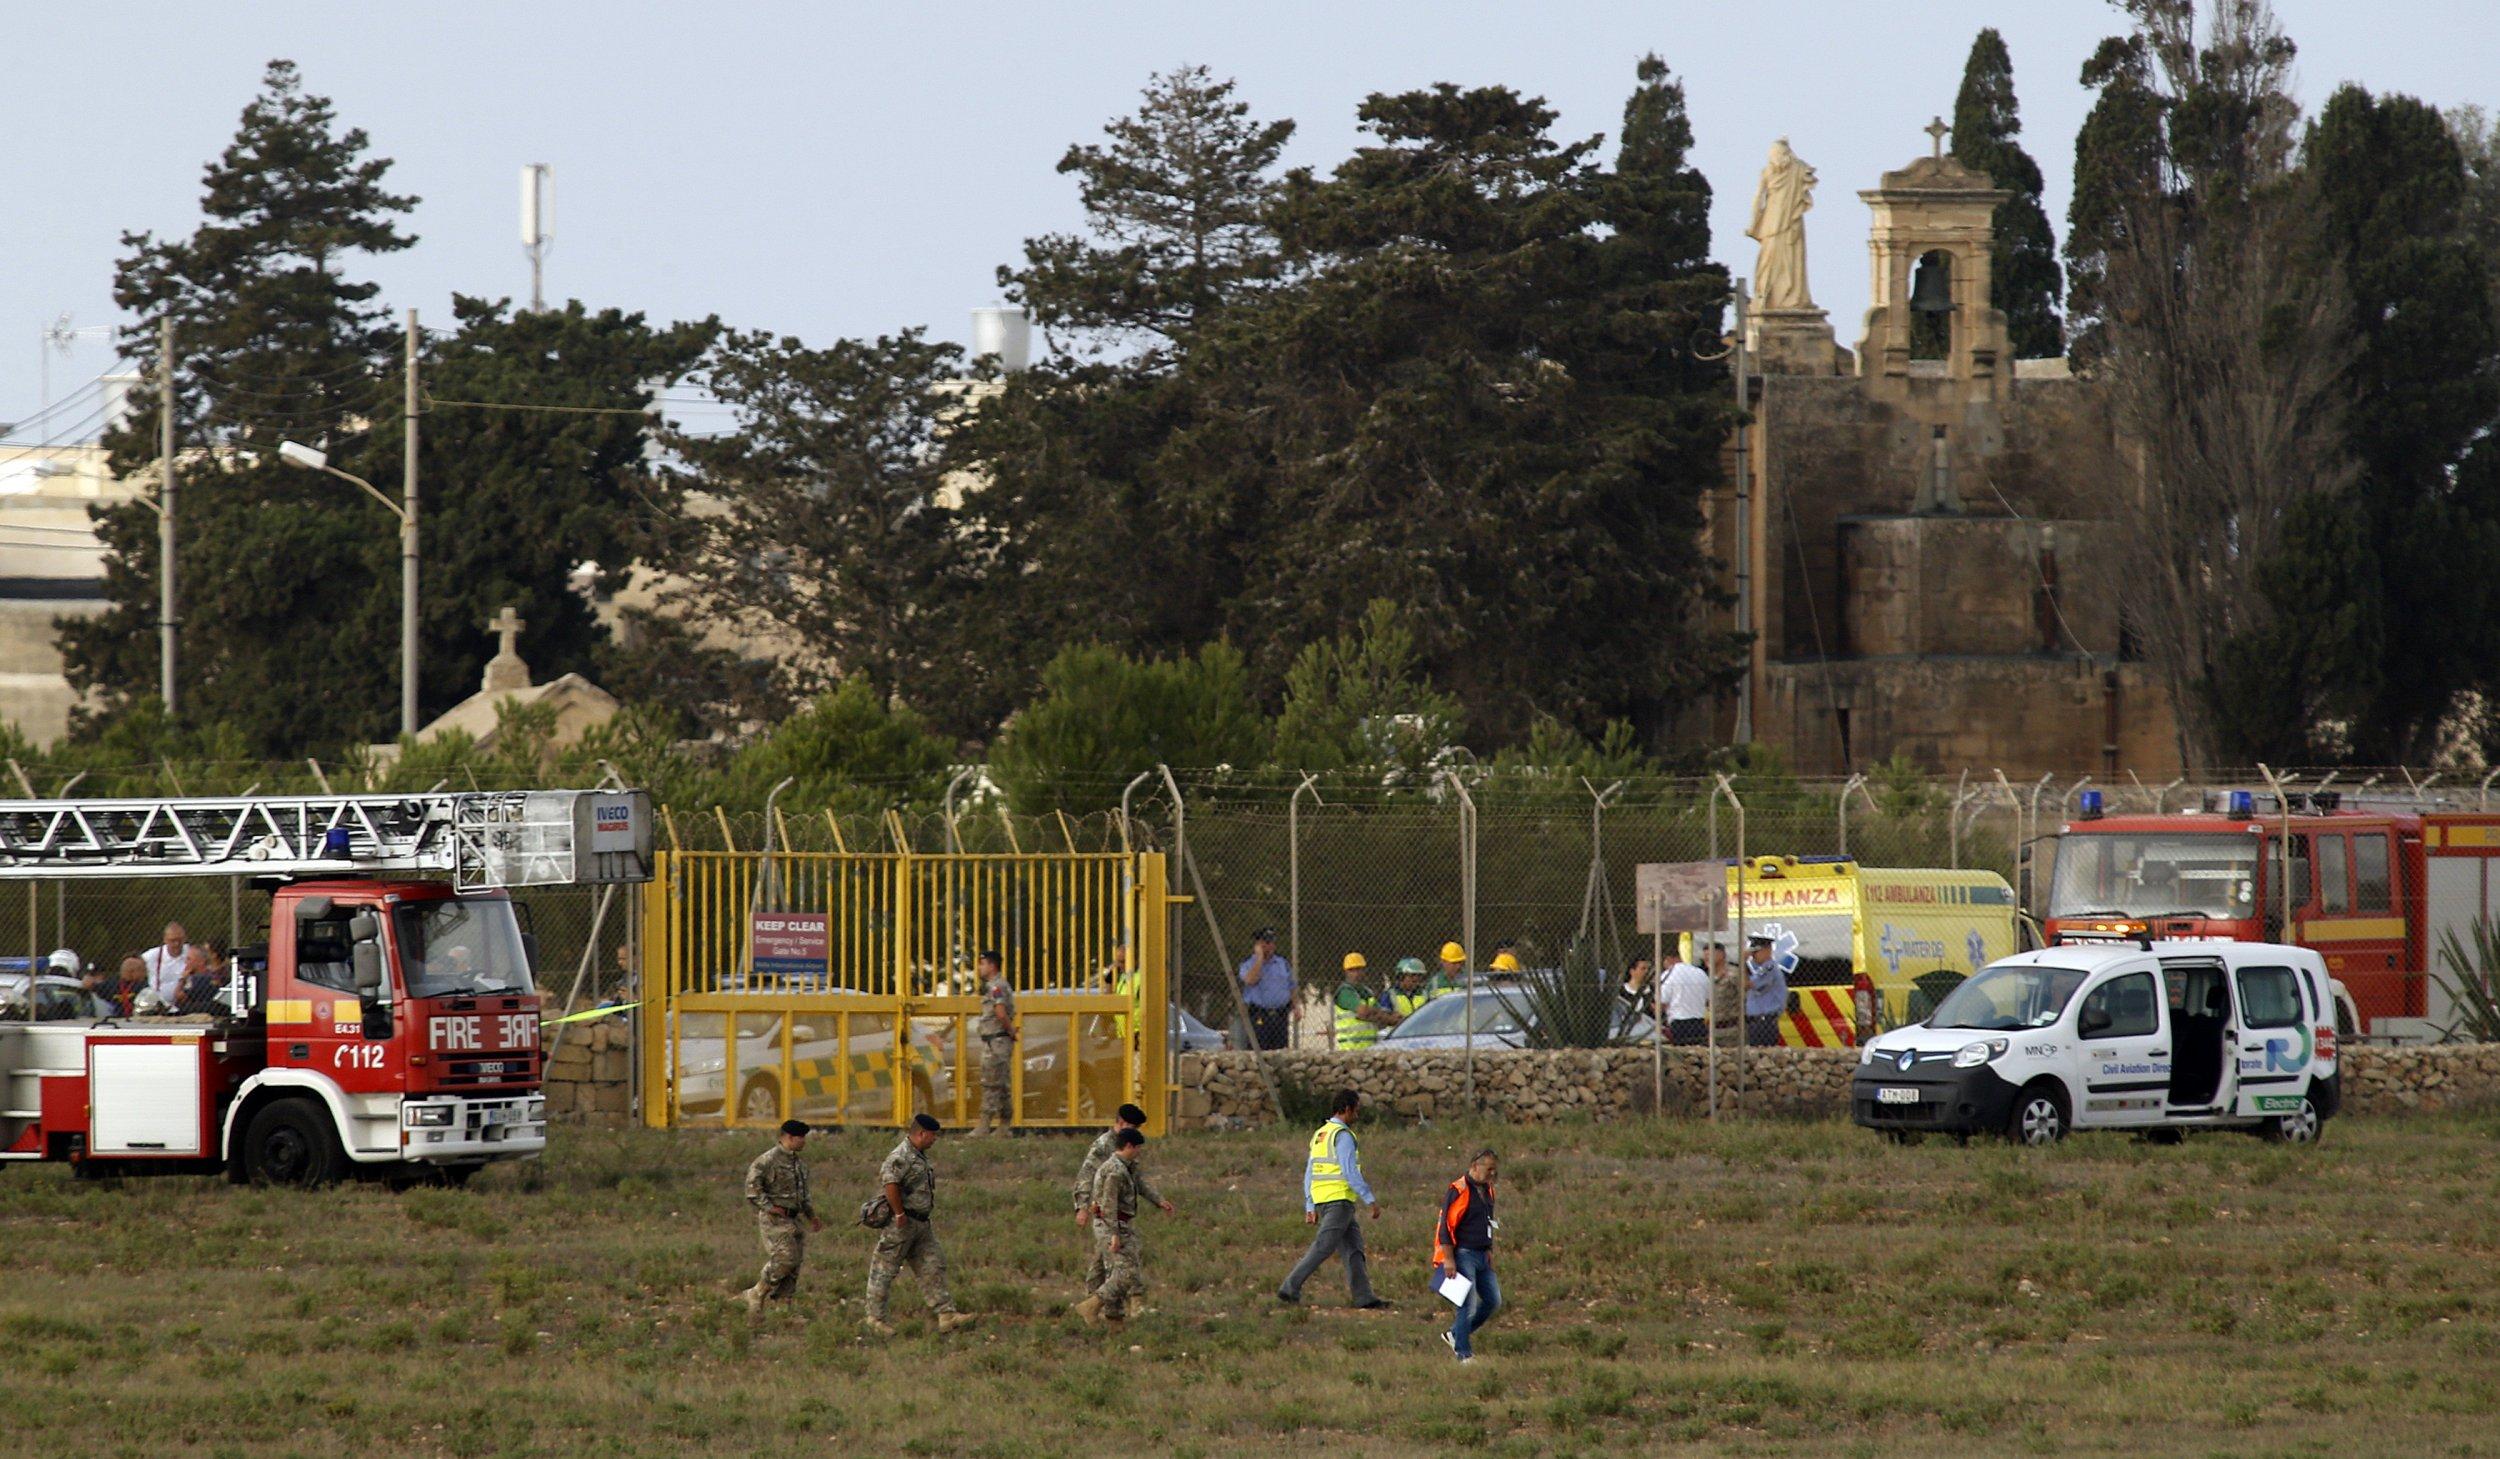 Scene of a light aircraft crash, Malta